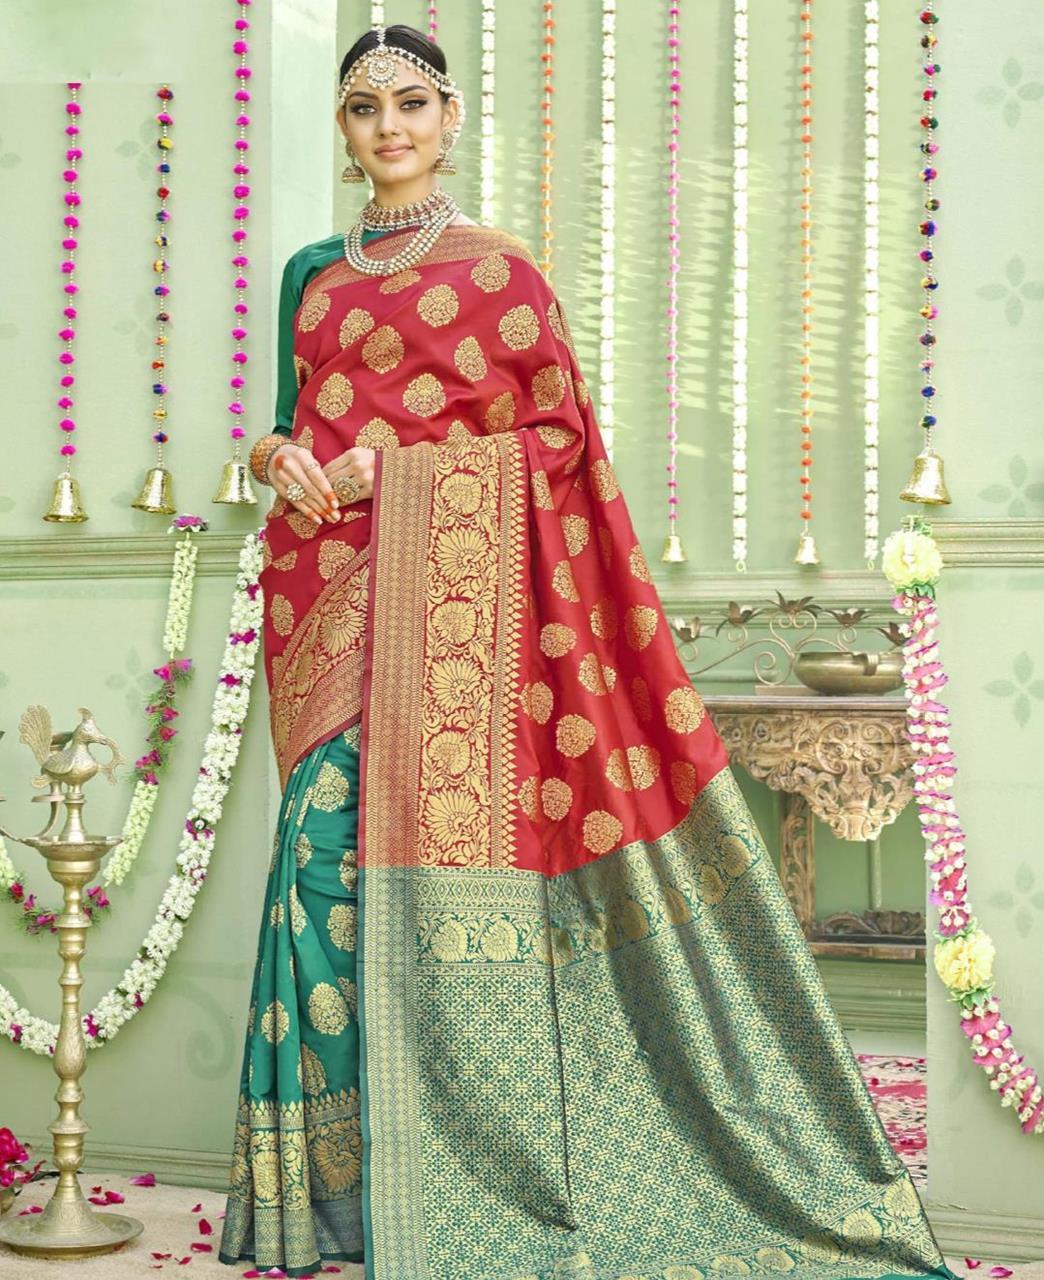 Woven Silk Saree (Sari) in Red